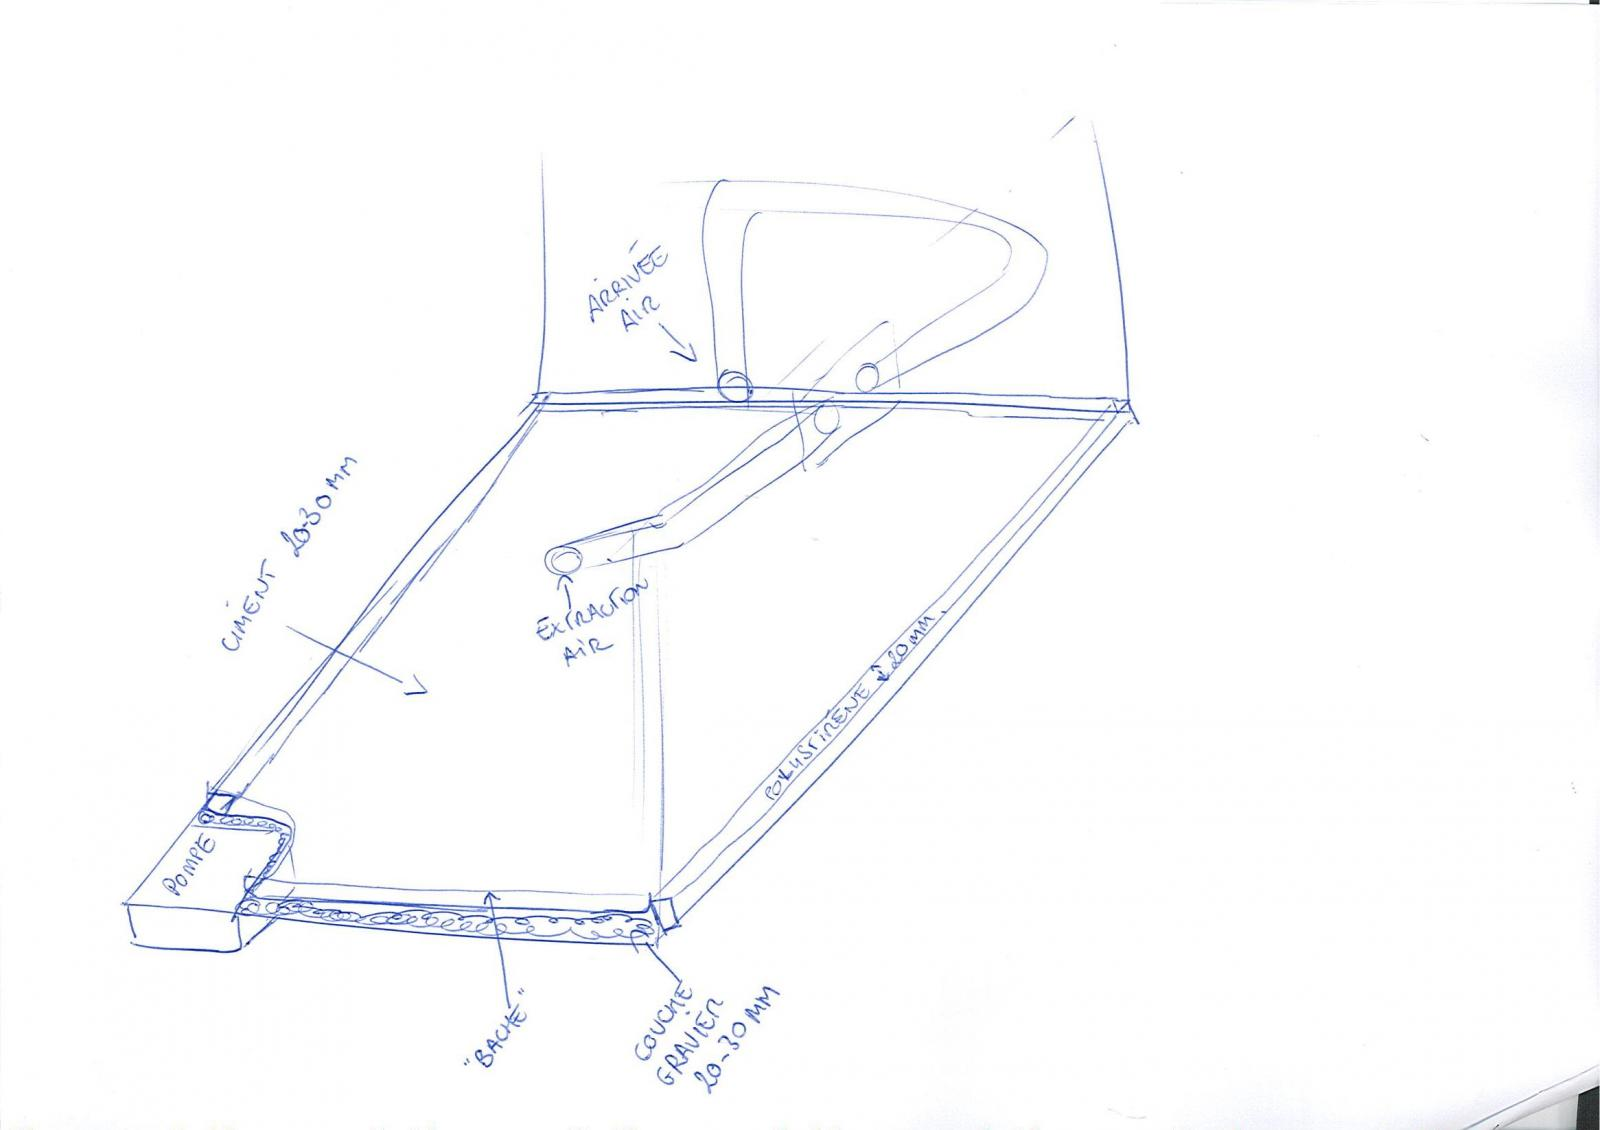 pb remont es capillaires cave. Black Bedroom Furniture Sets. Home Design Ideas